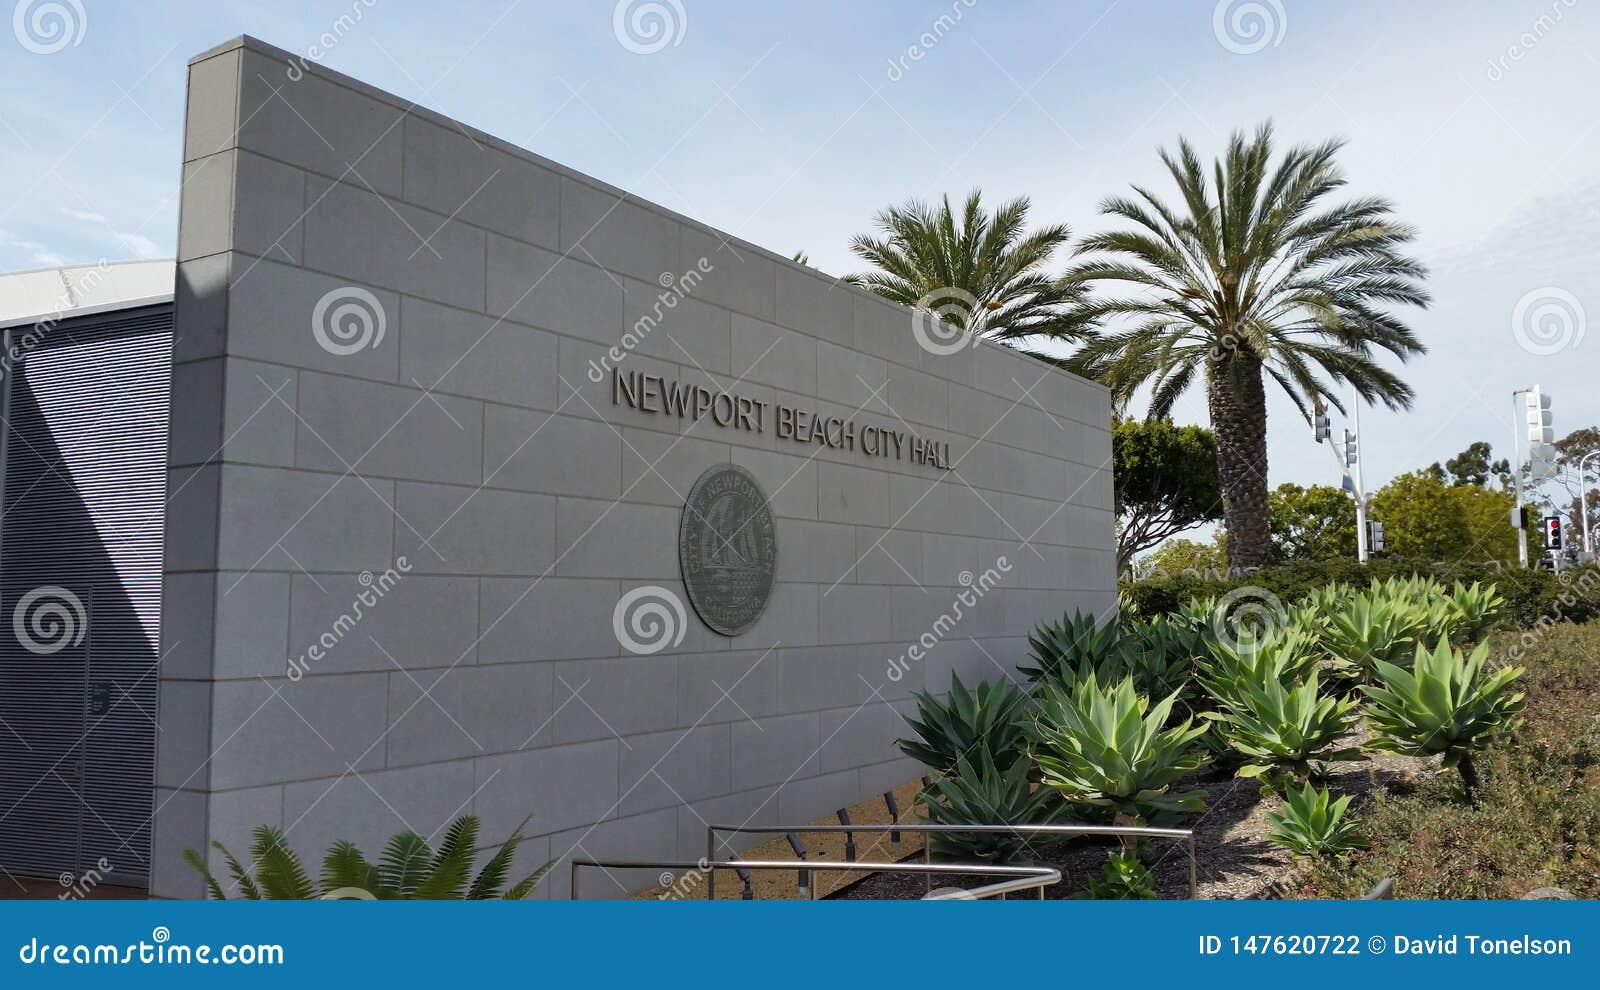 Newport Beach City Hall sign